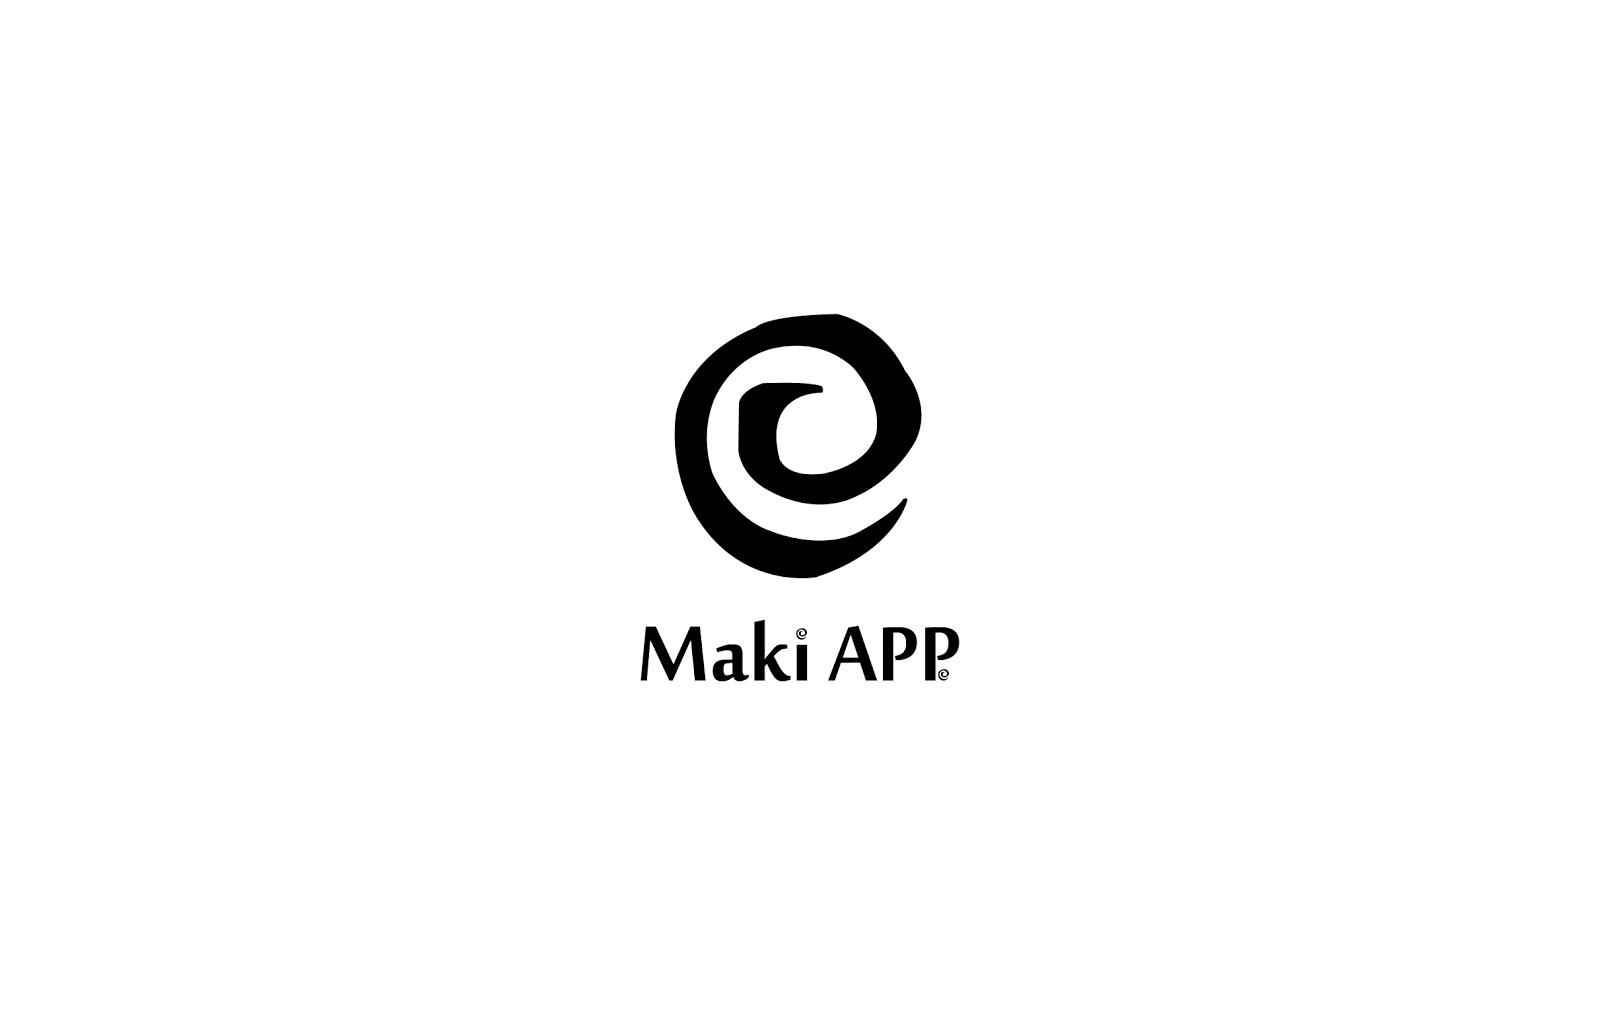 Maki App